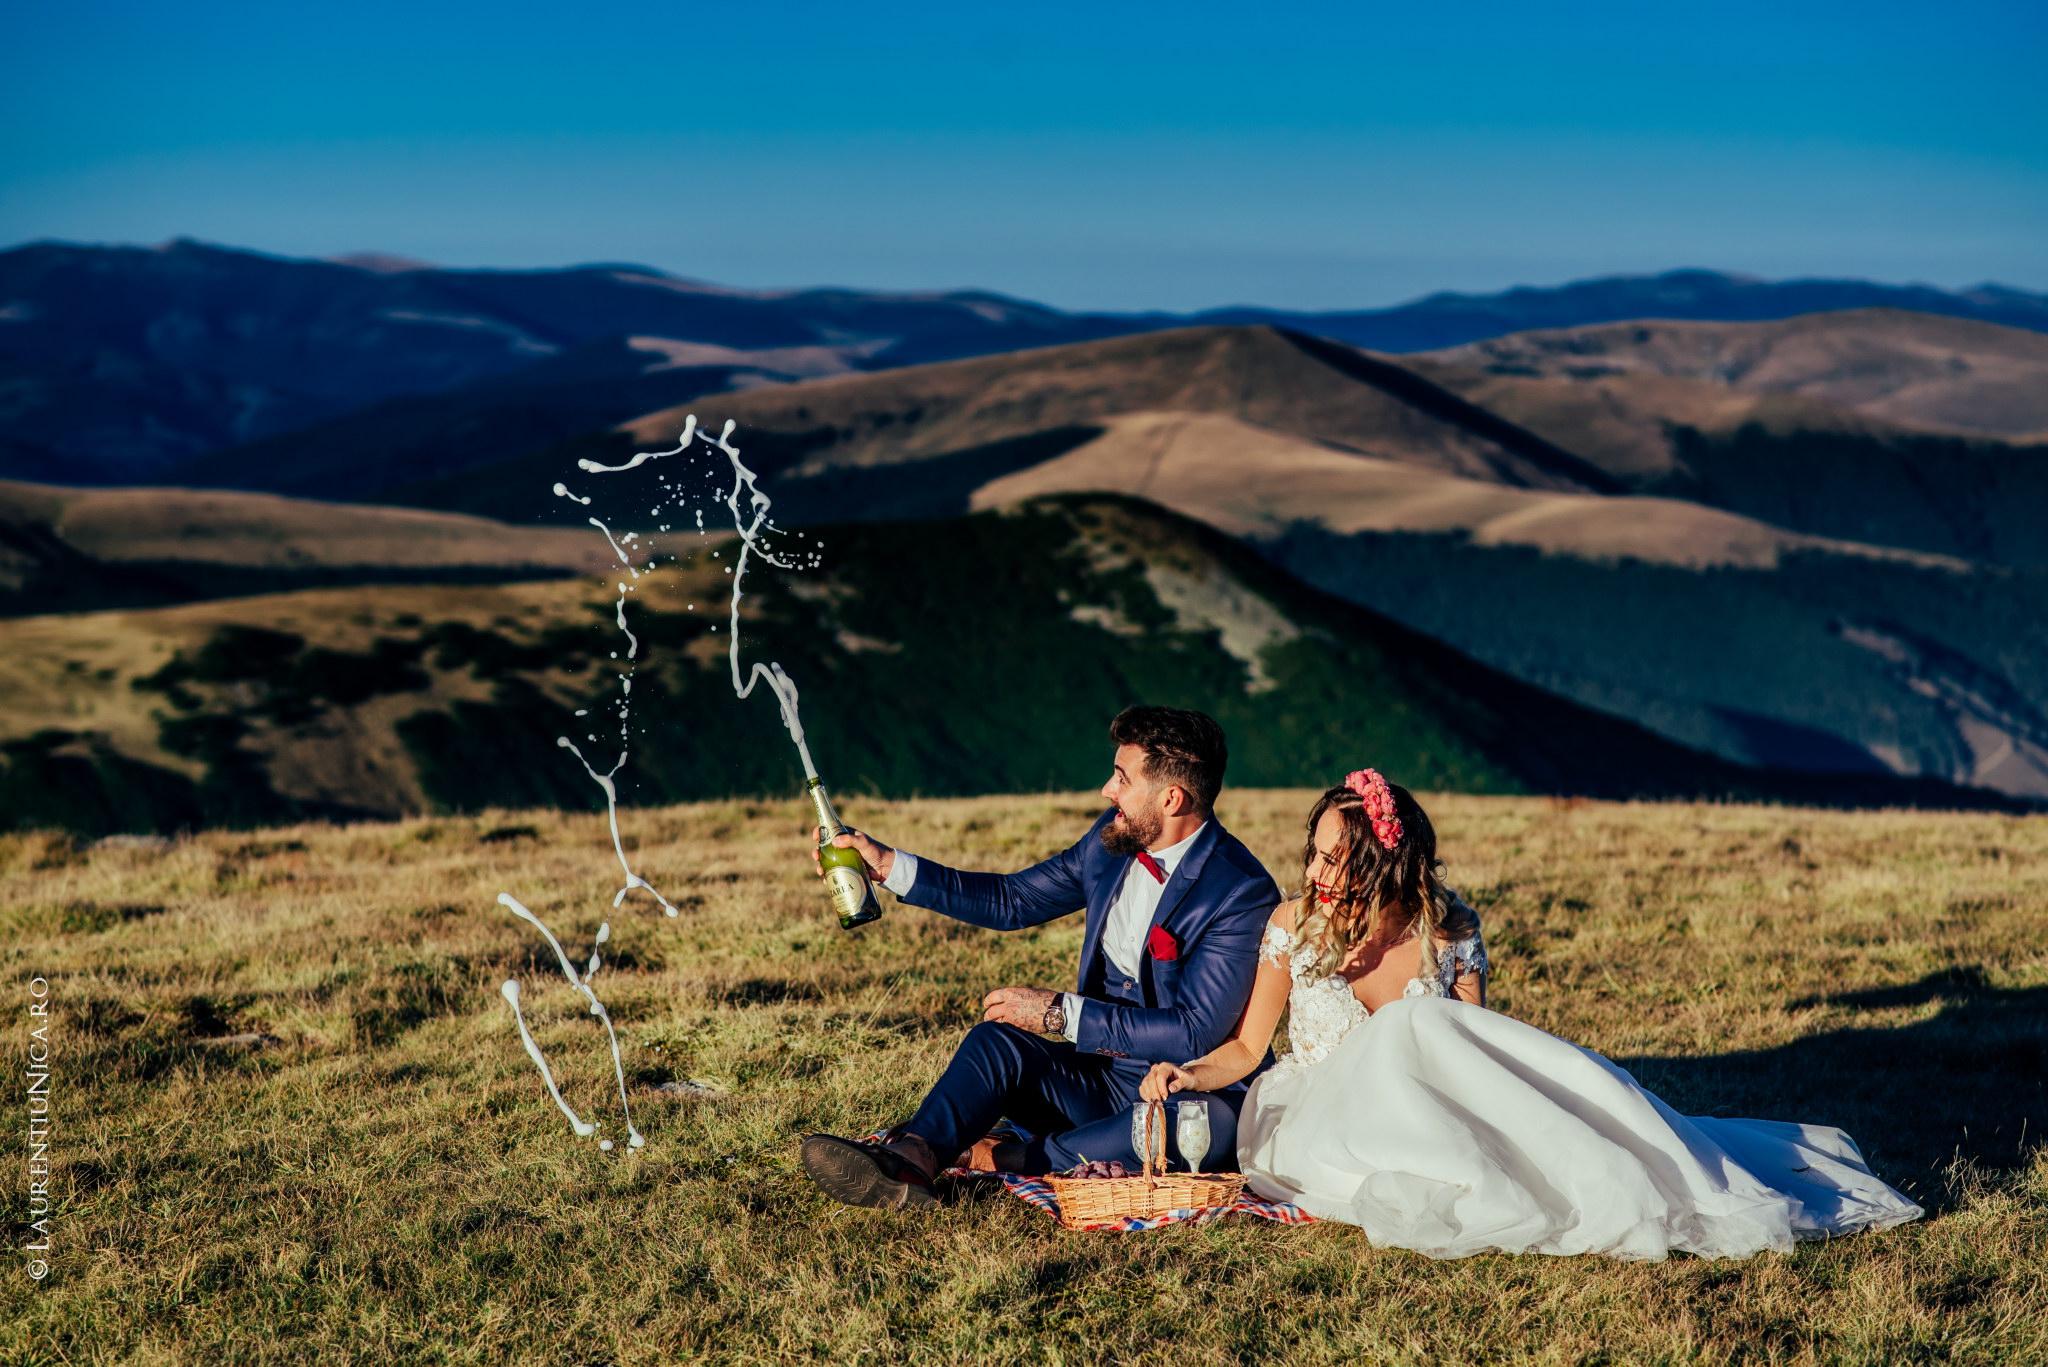 aida si alin fotograf nunta laurentiu nica transalpina 19 - Aida & Alin | Fotografii After Wedding | Transalpina - Muntii Parang